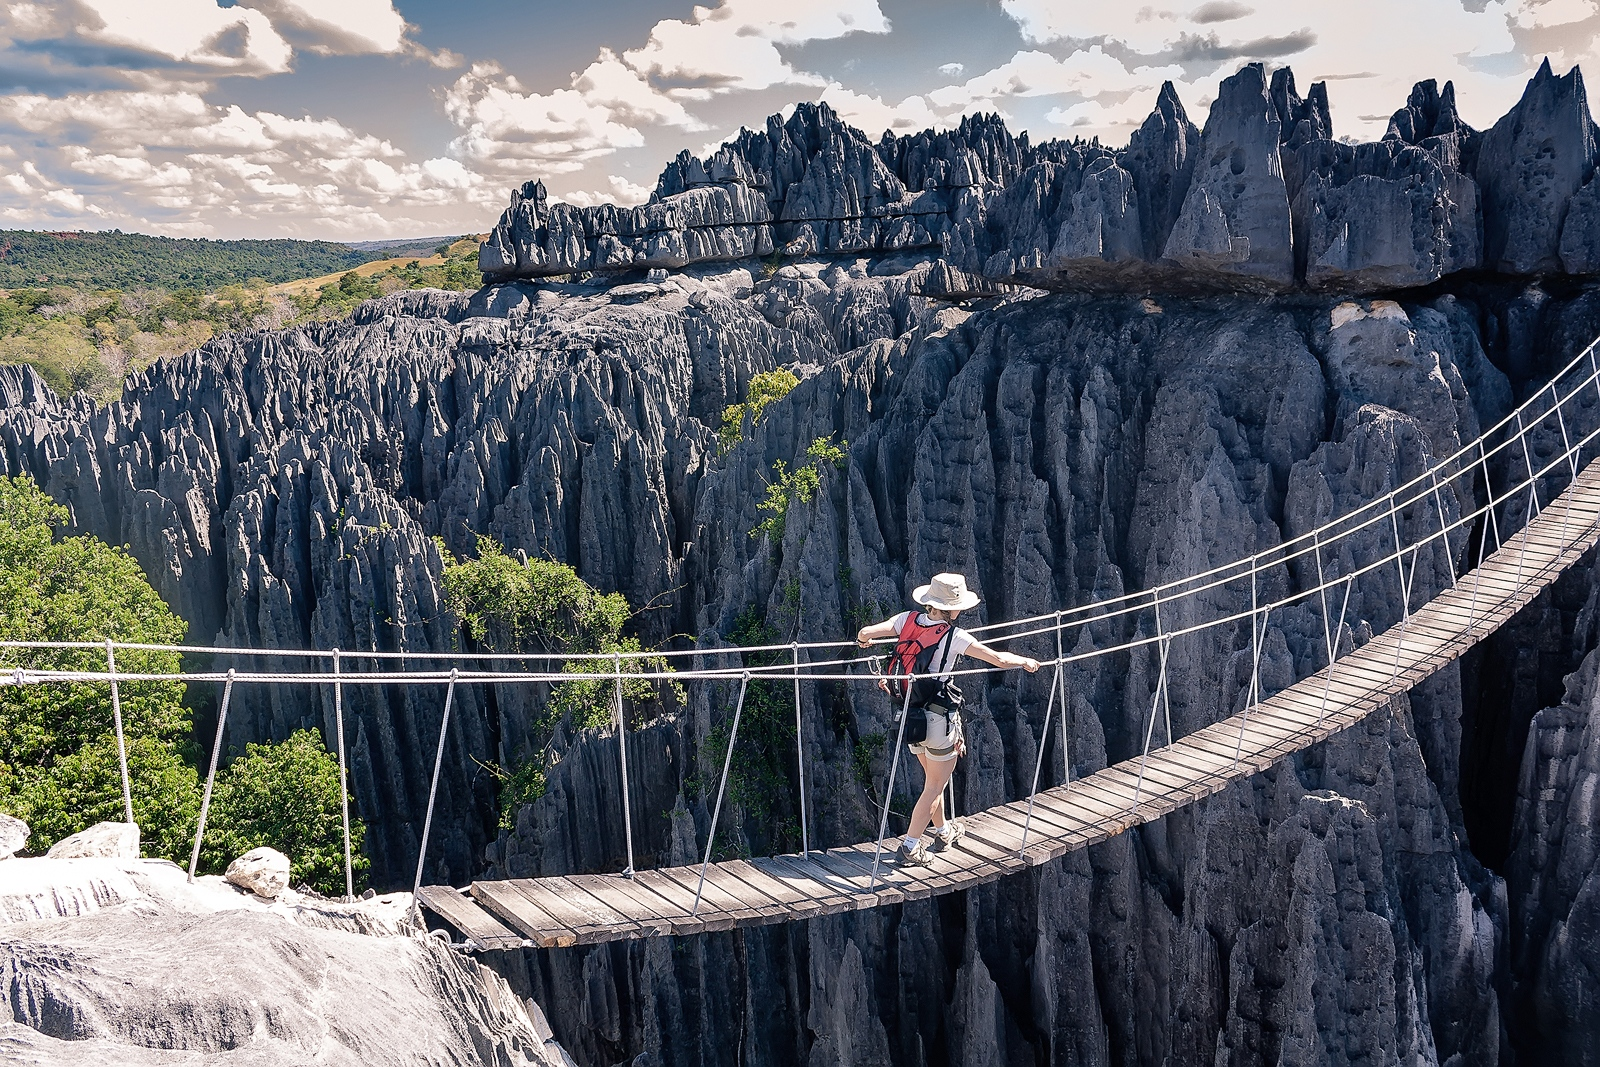 Tsingy de Bemaraha. Madagascar.